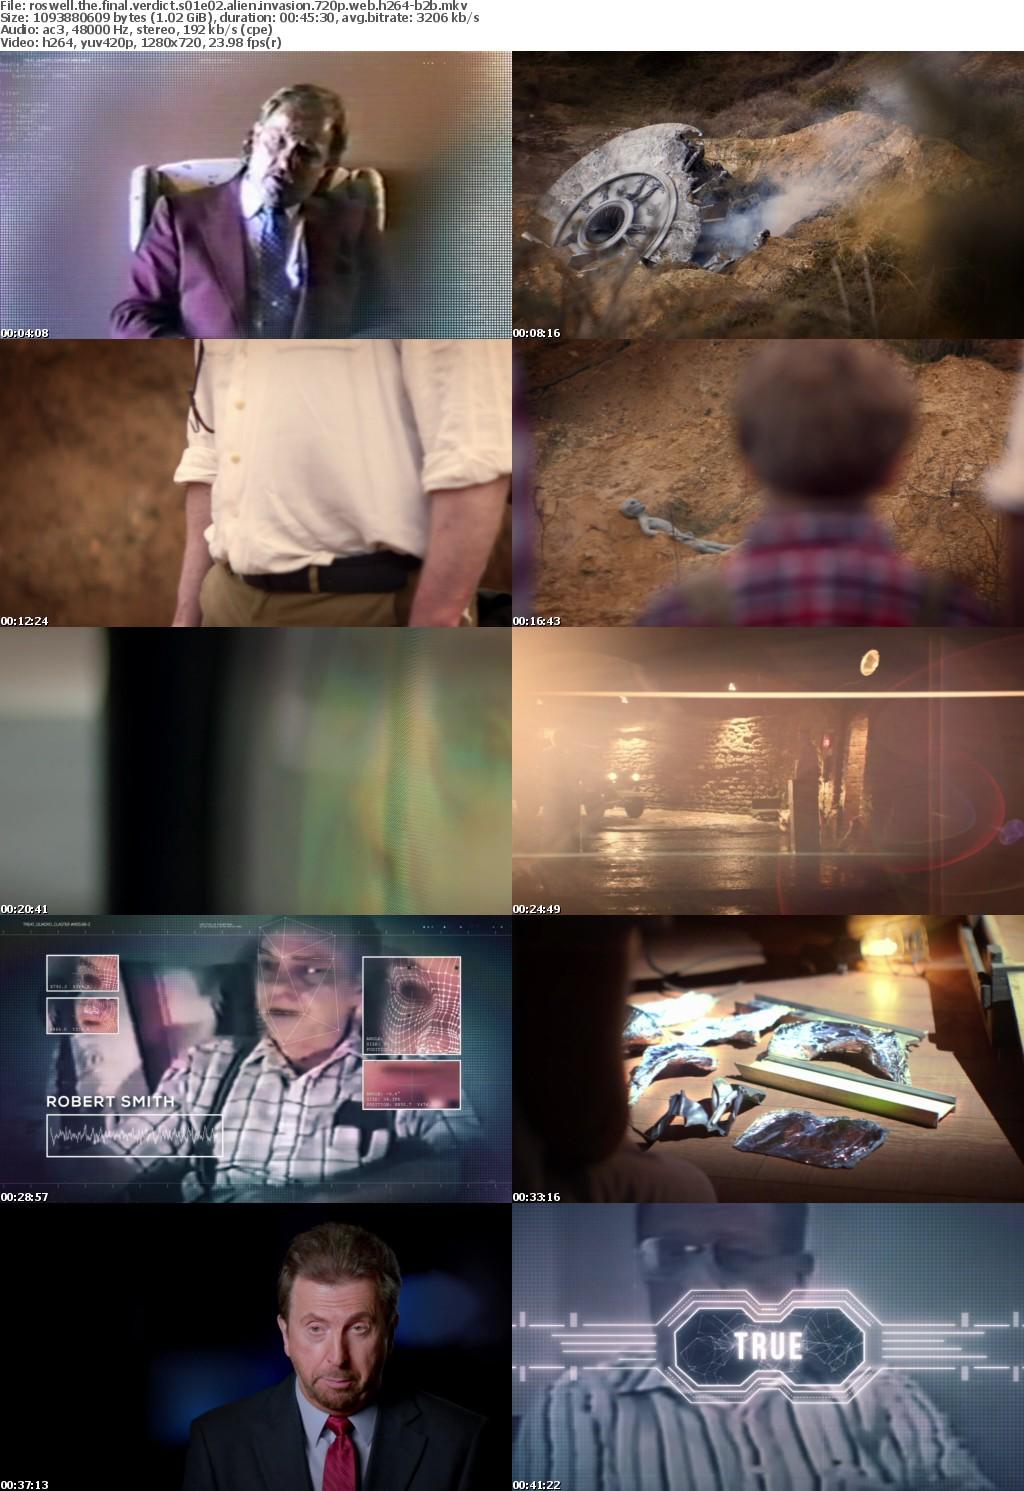 Roswell The Final Verdict S01E02 Alien Invasion 720p WEB h264-B2B